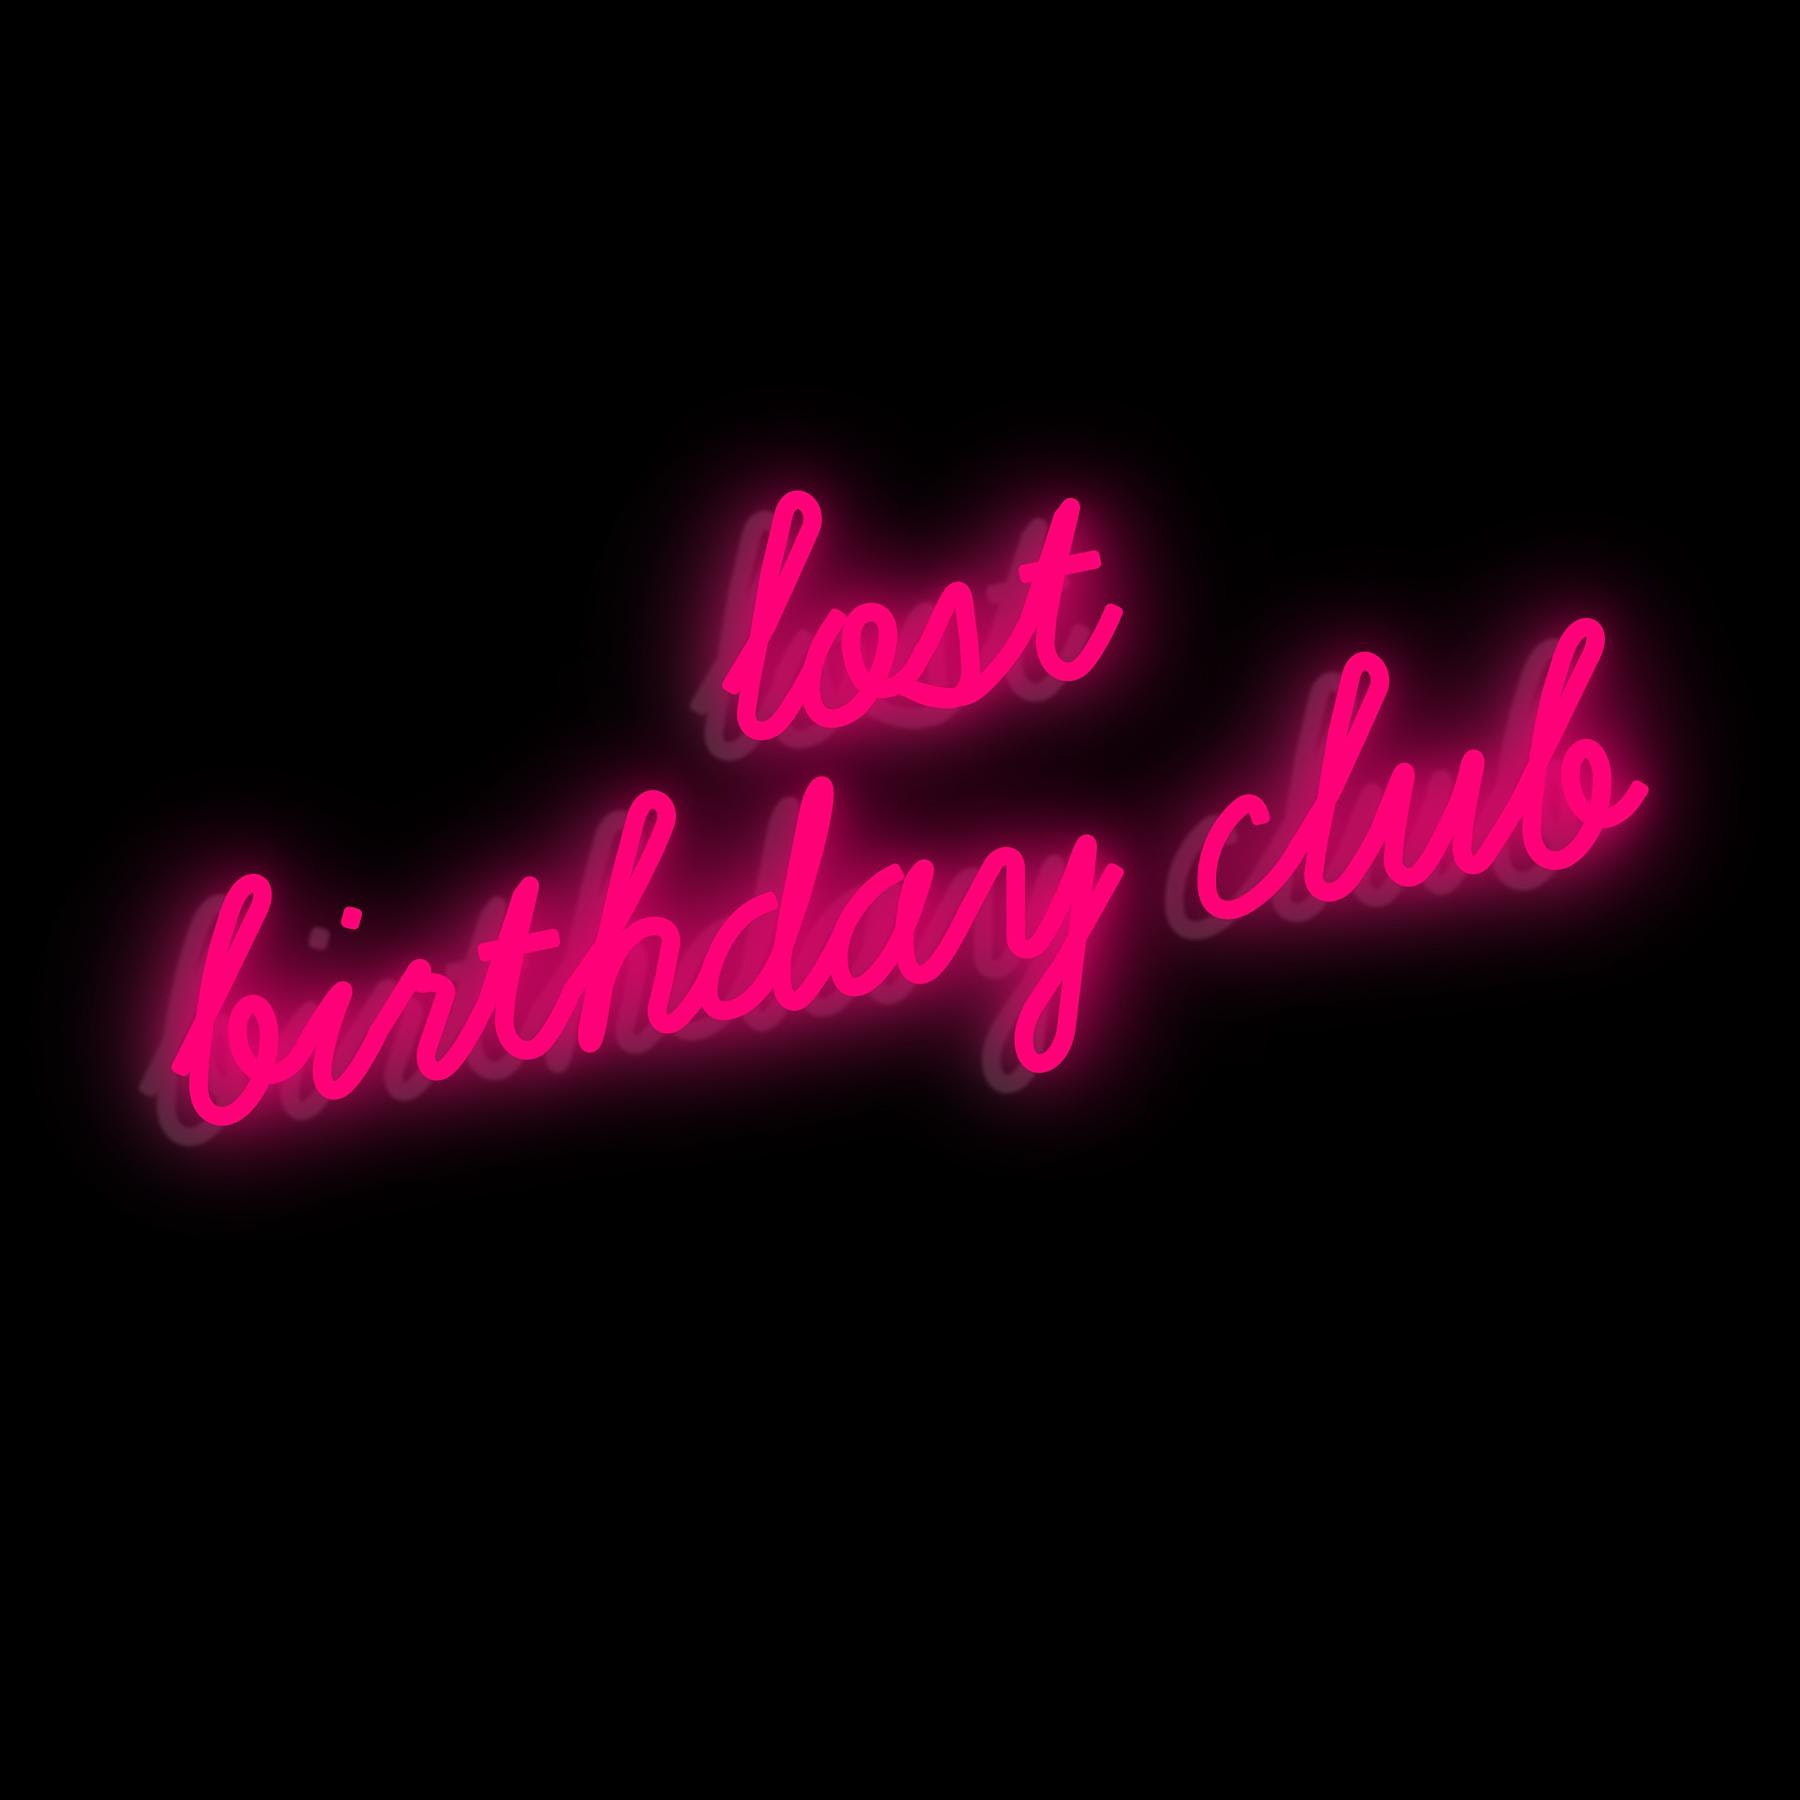 Lost Birthday Club